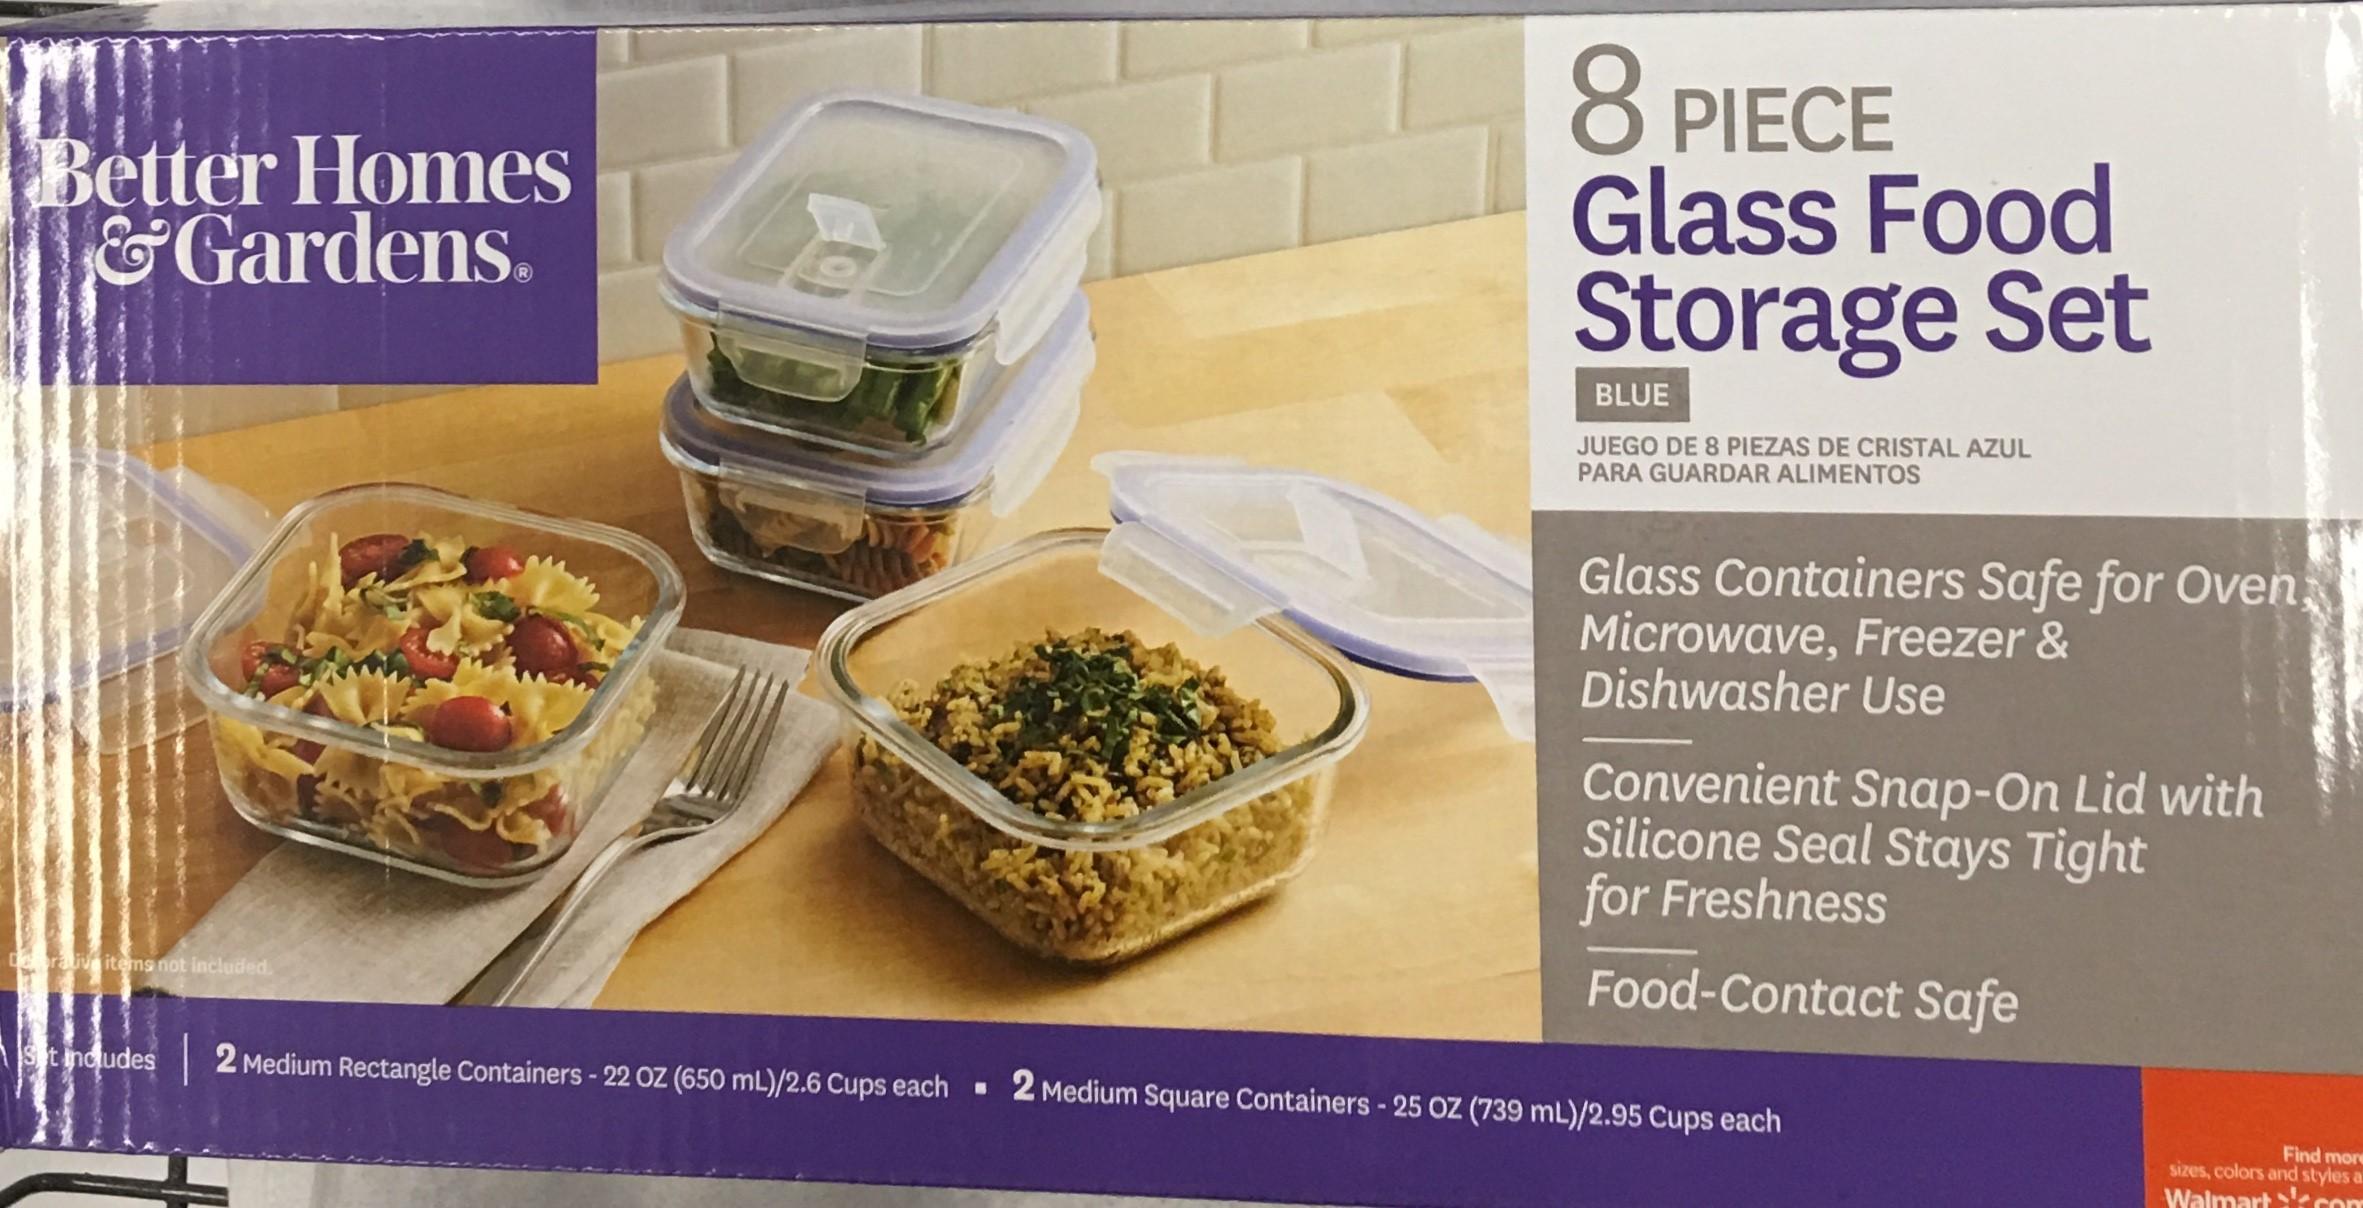 Glass Food Storage Sets